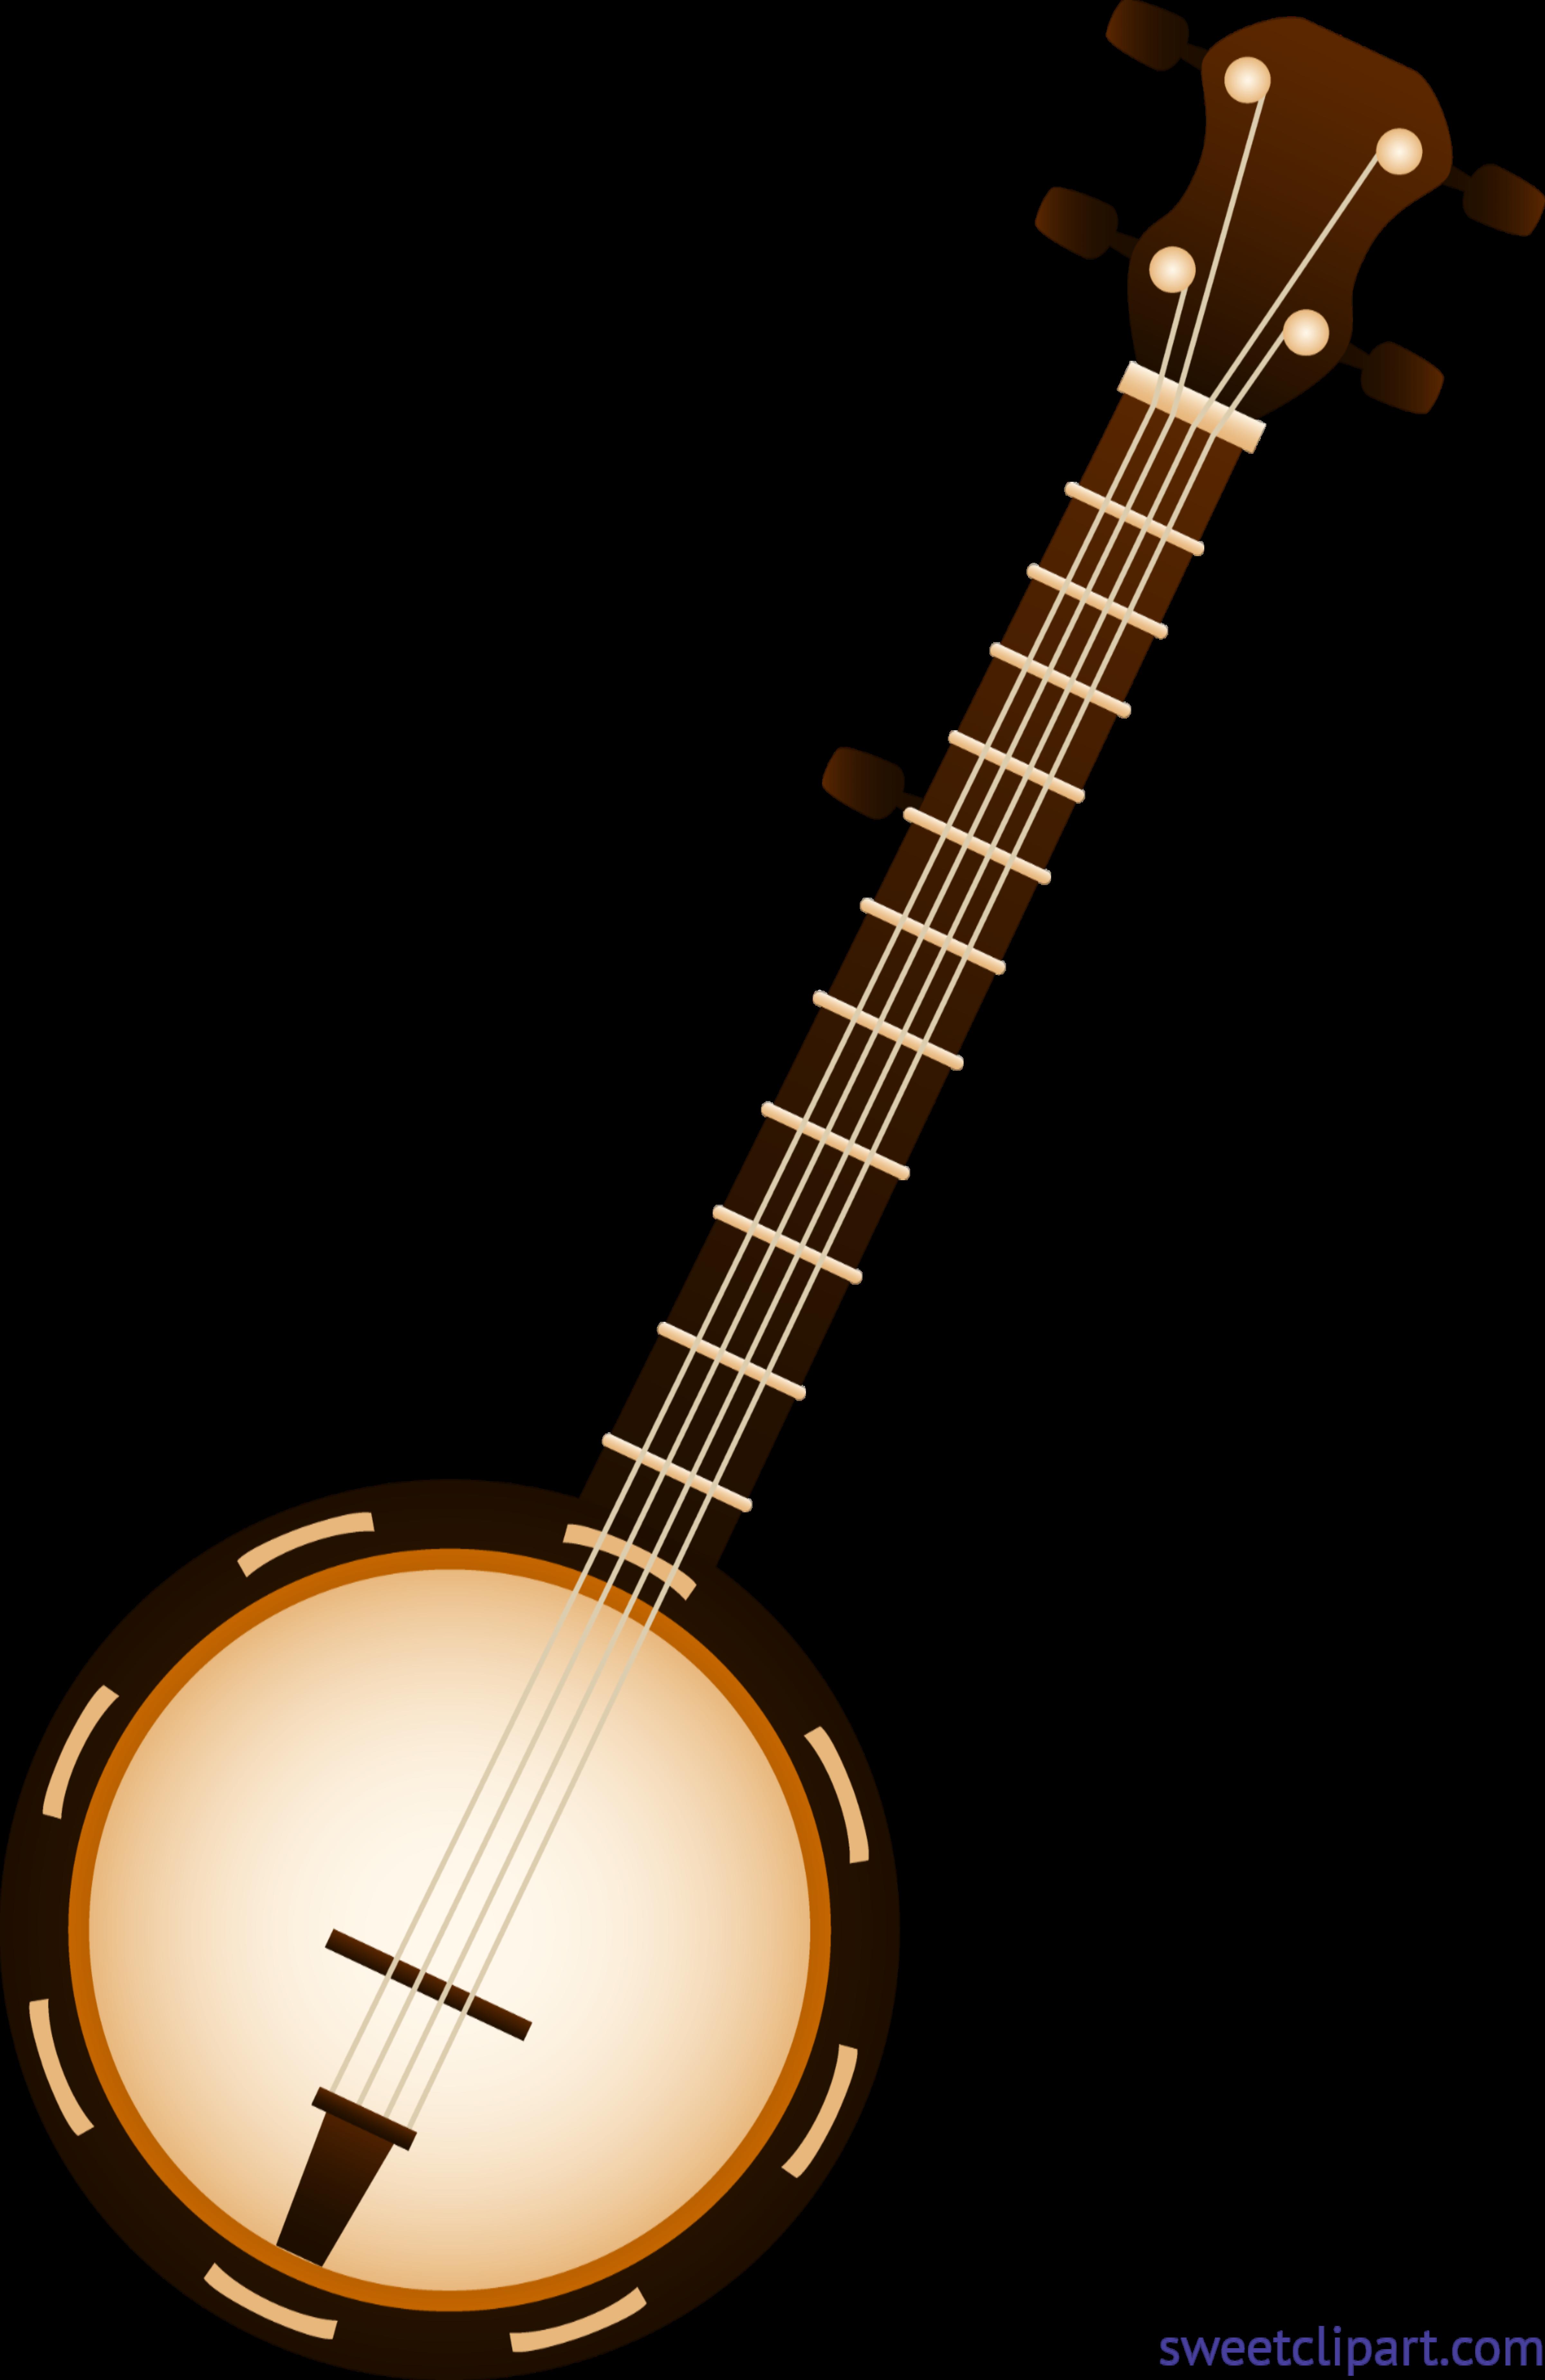 Banjo clipart. Clip art sweet